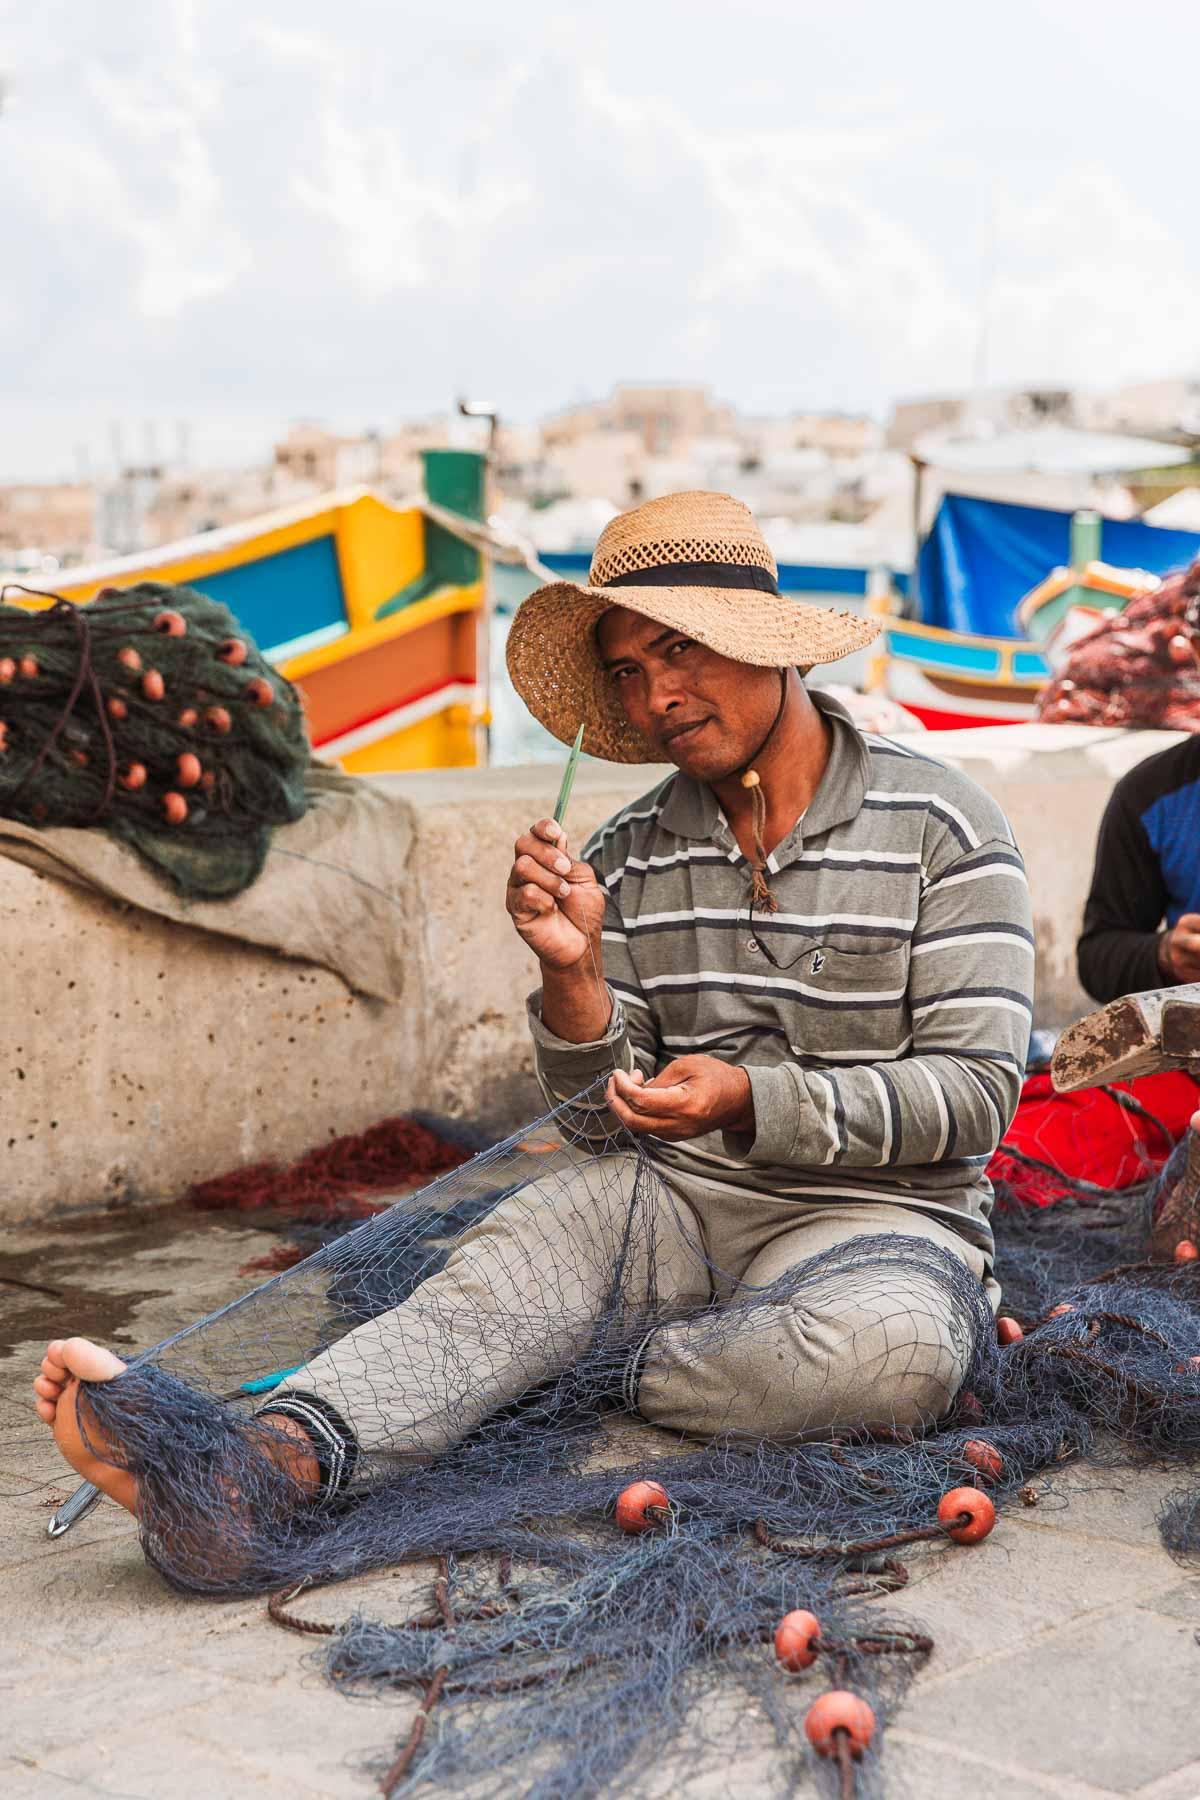 Bronwyn Townsend Malta Marsaxlokk Fisherman